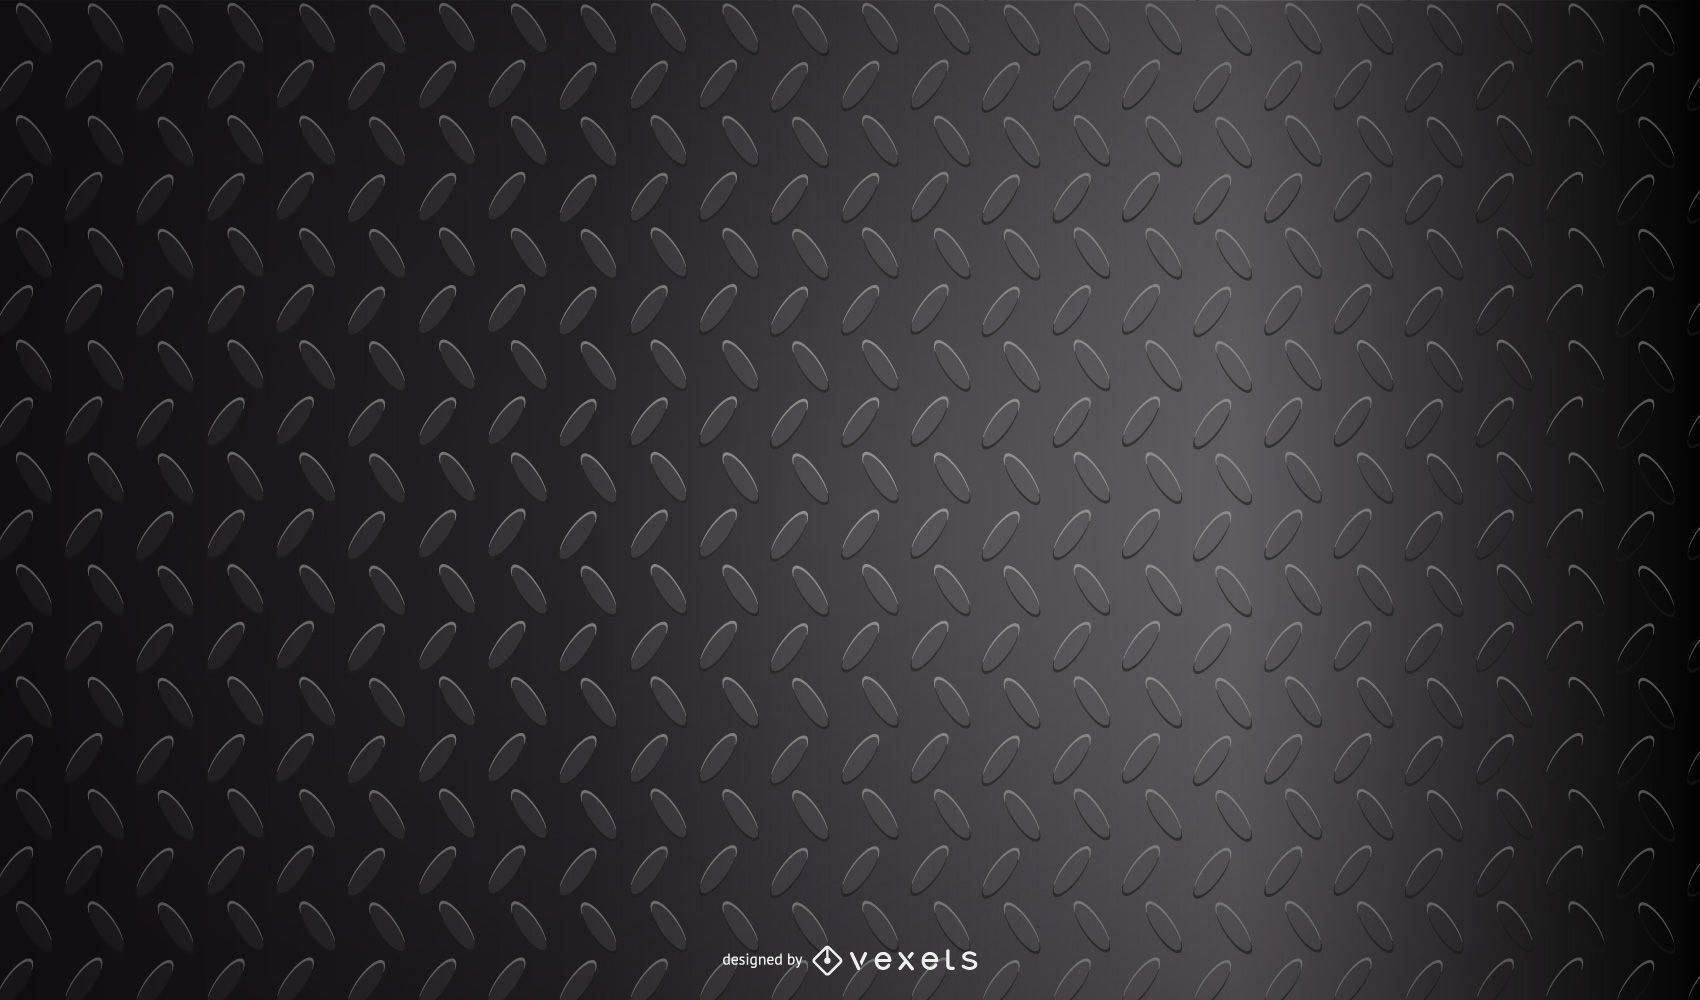 Textura de metal geométrica